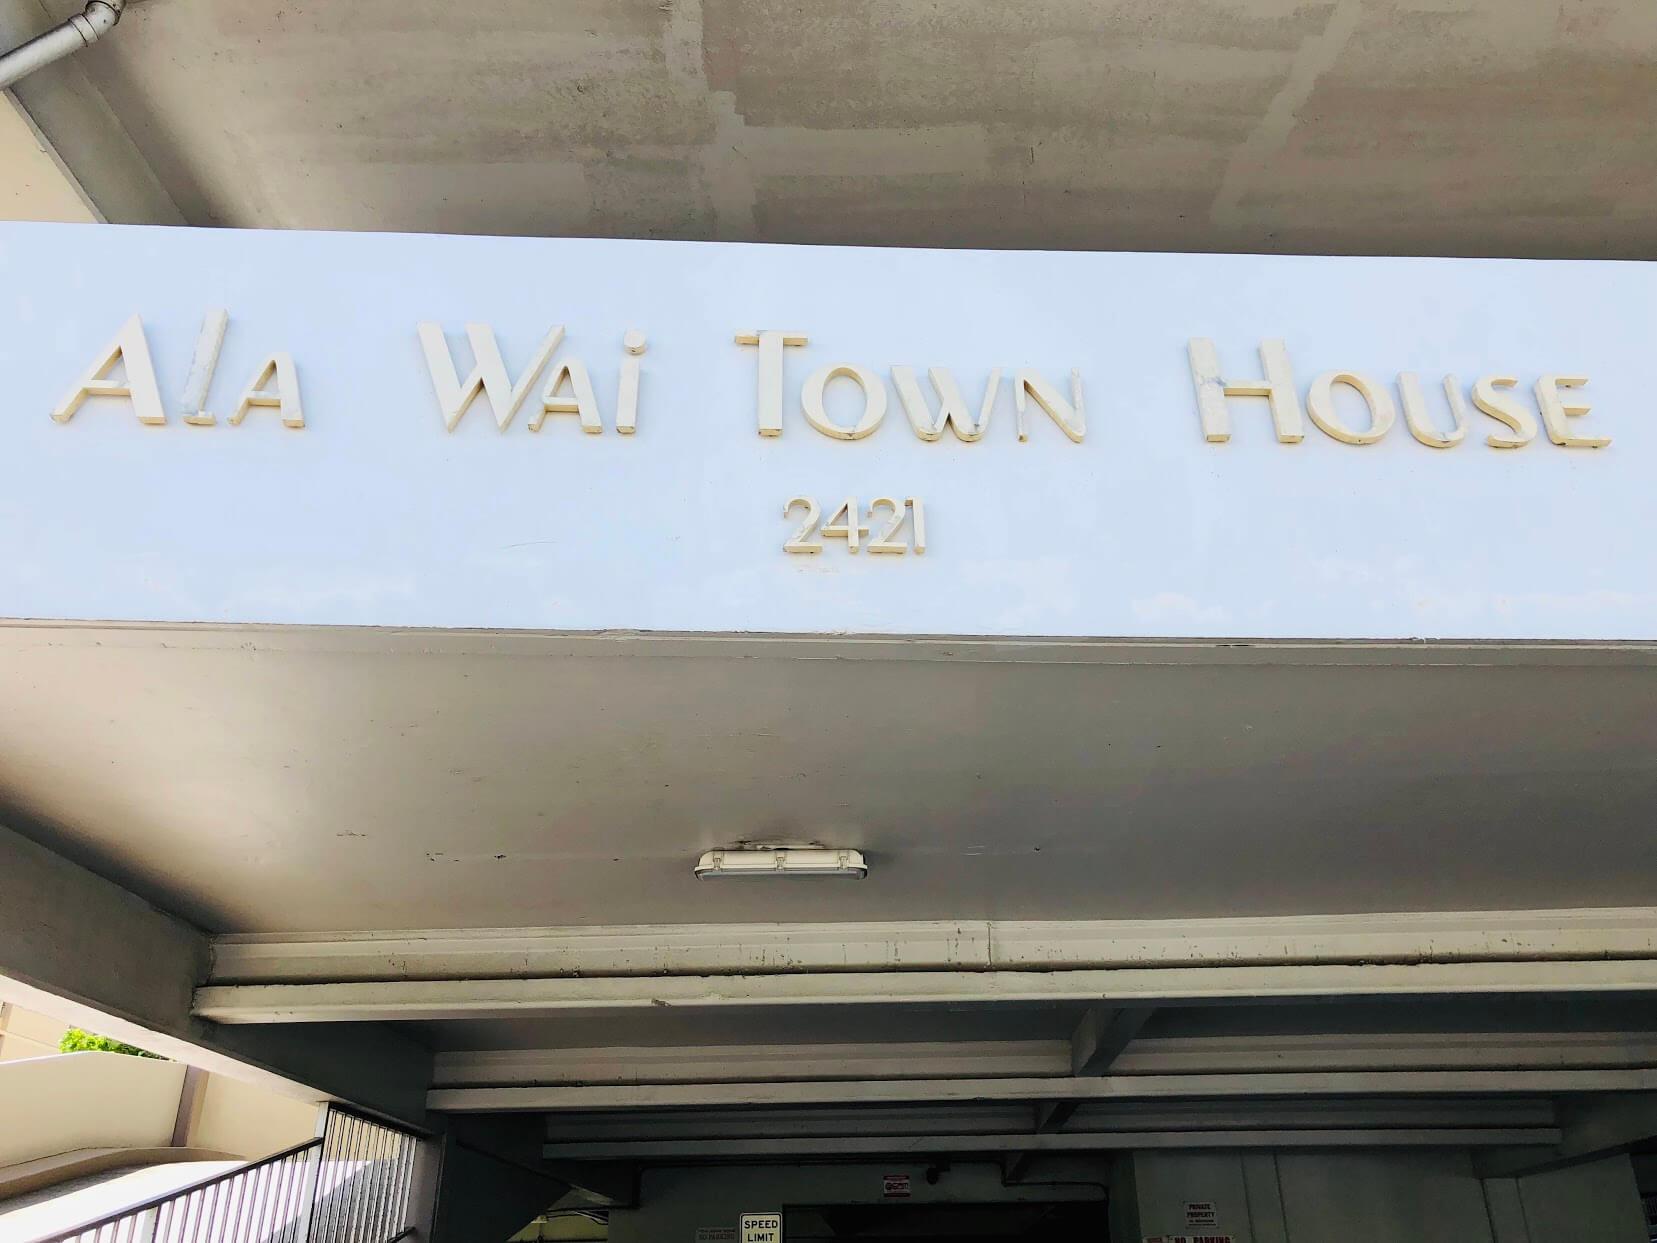 Ala Wai Town Houseの看板